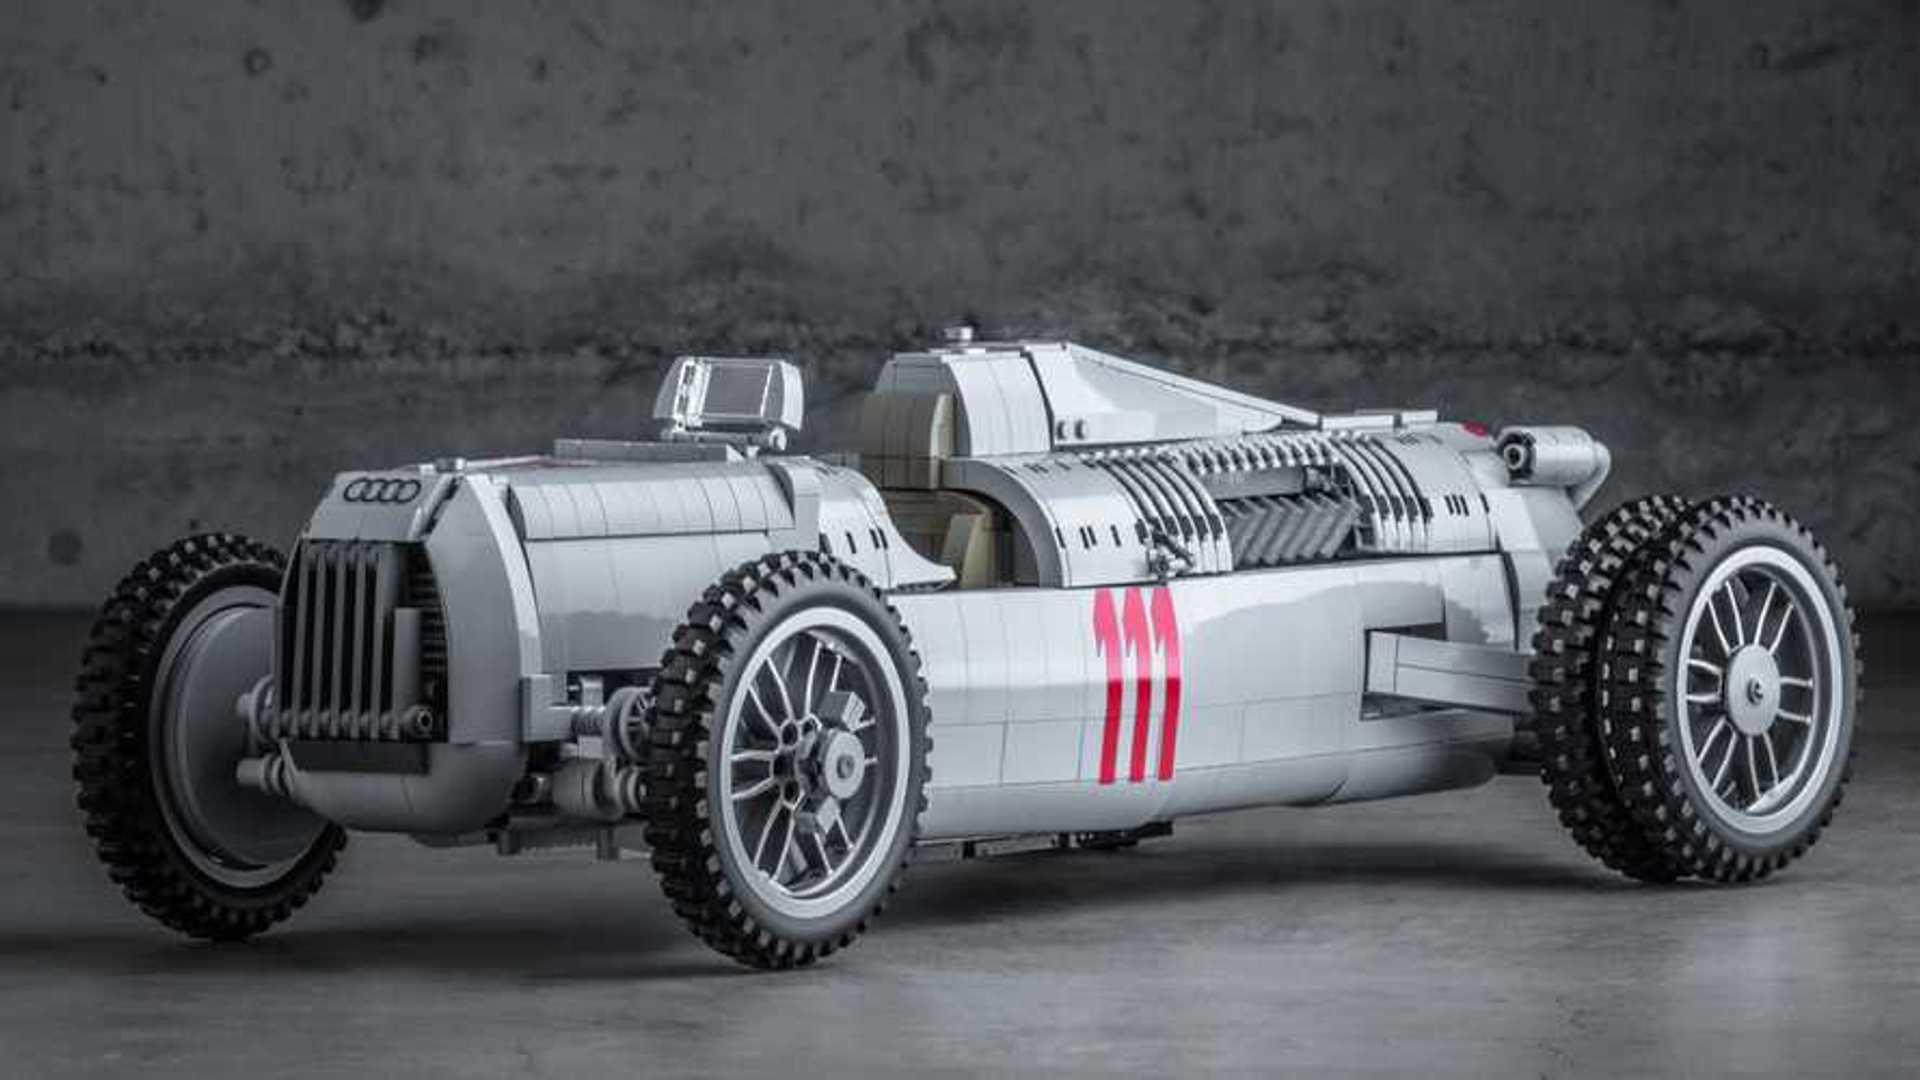 Amazing Lego Auto Union Race Car Needs Your Support